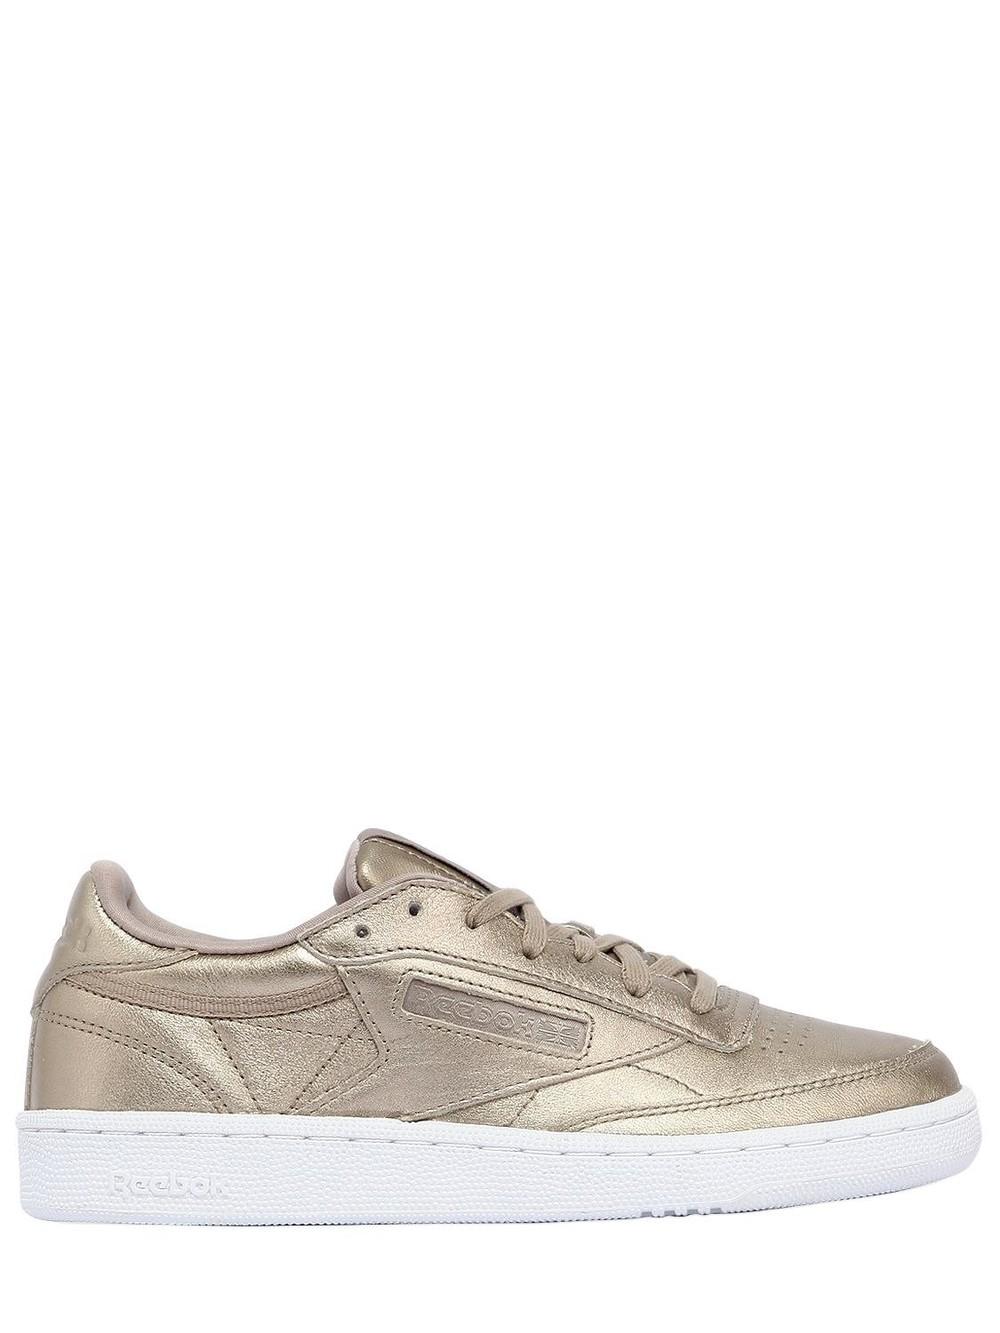 REEBOK CLASSICS Club C 85 Hype Metallic Leather Sneakers